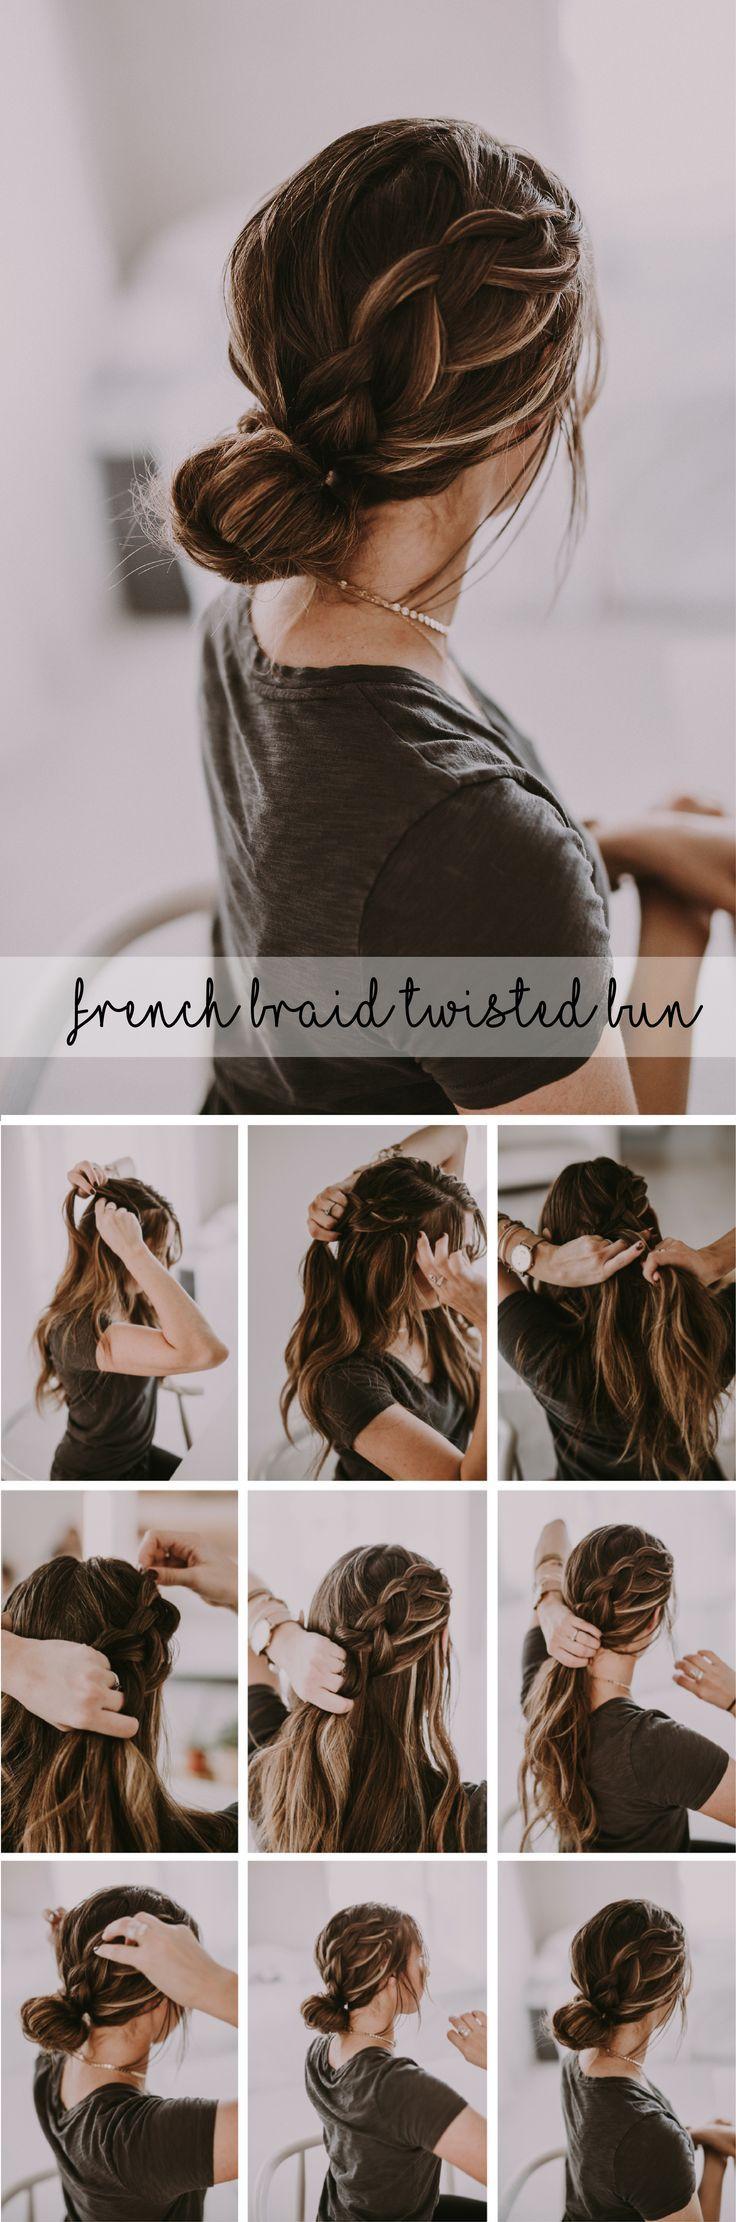 French braid bun tutorials hair and beauty pinterest twist bun